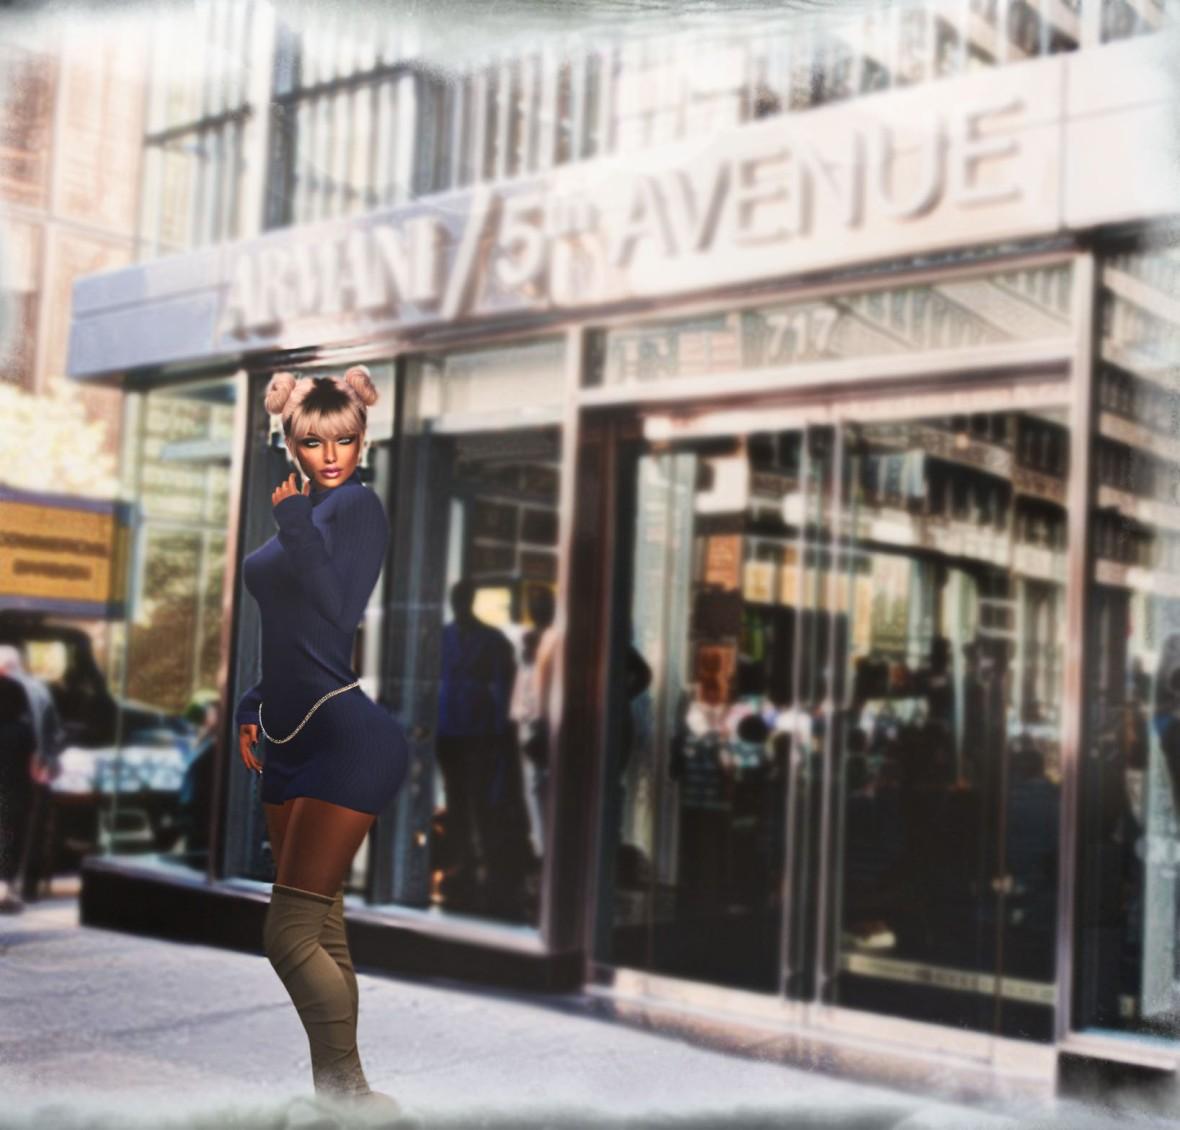 Giorgio Armani luxury fashion designer store at Fifth Avenue, Manhattan, New York City, USA,  shop, fashion, brand, chic